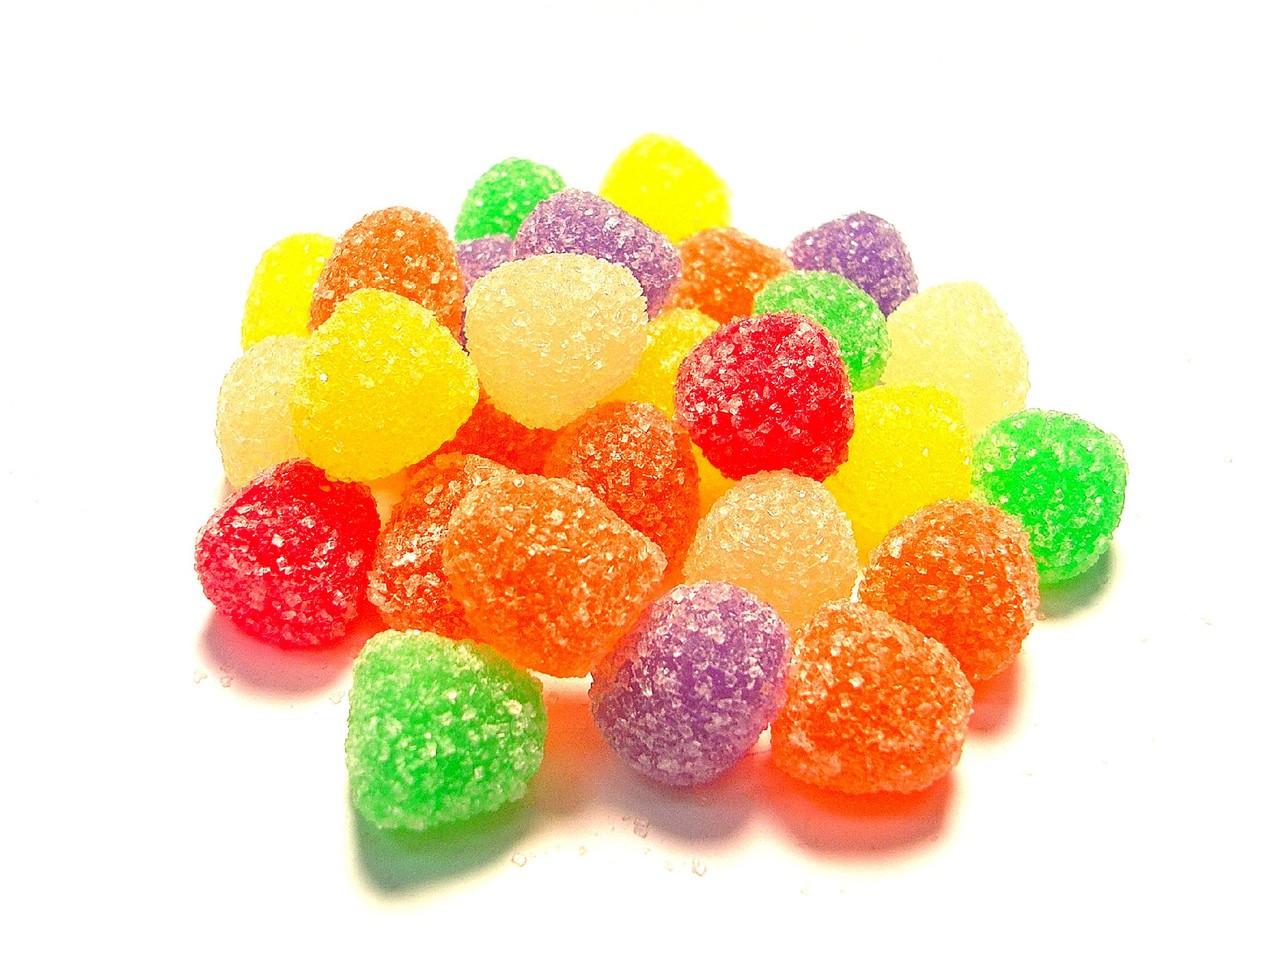 Spice Gum Drops